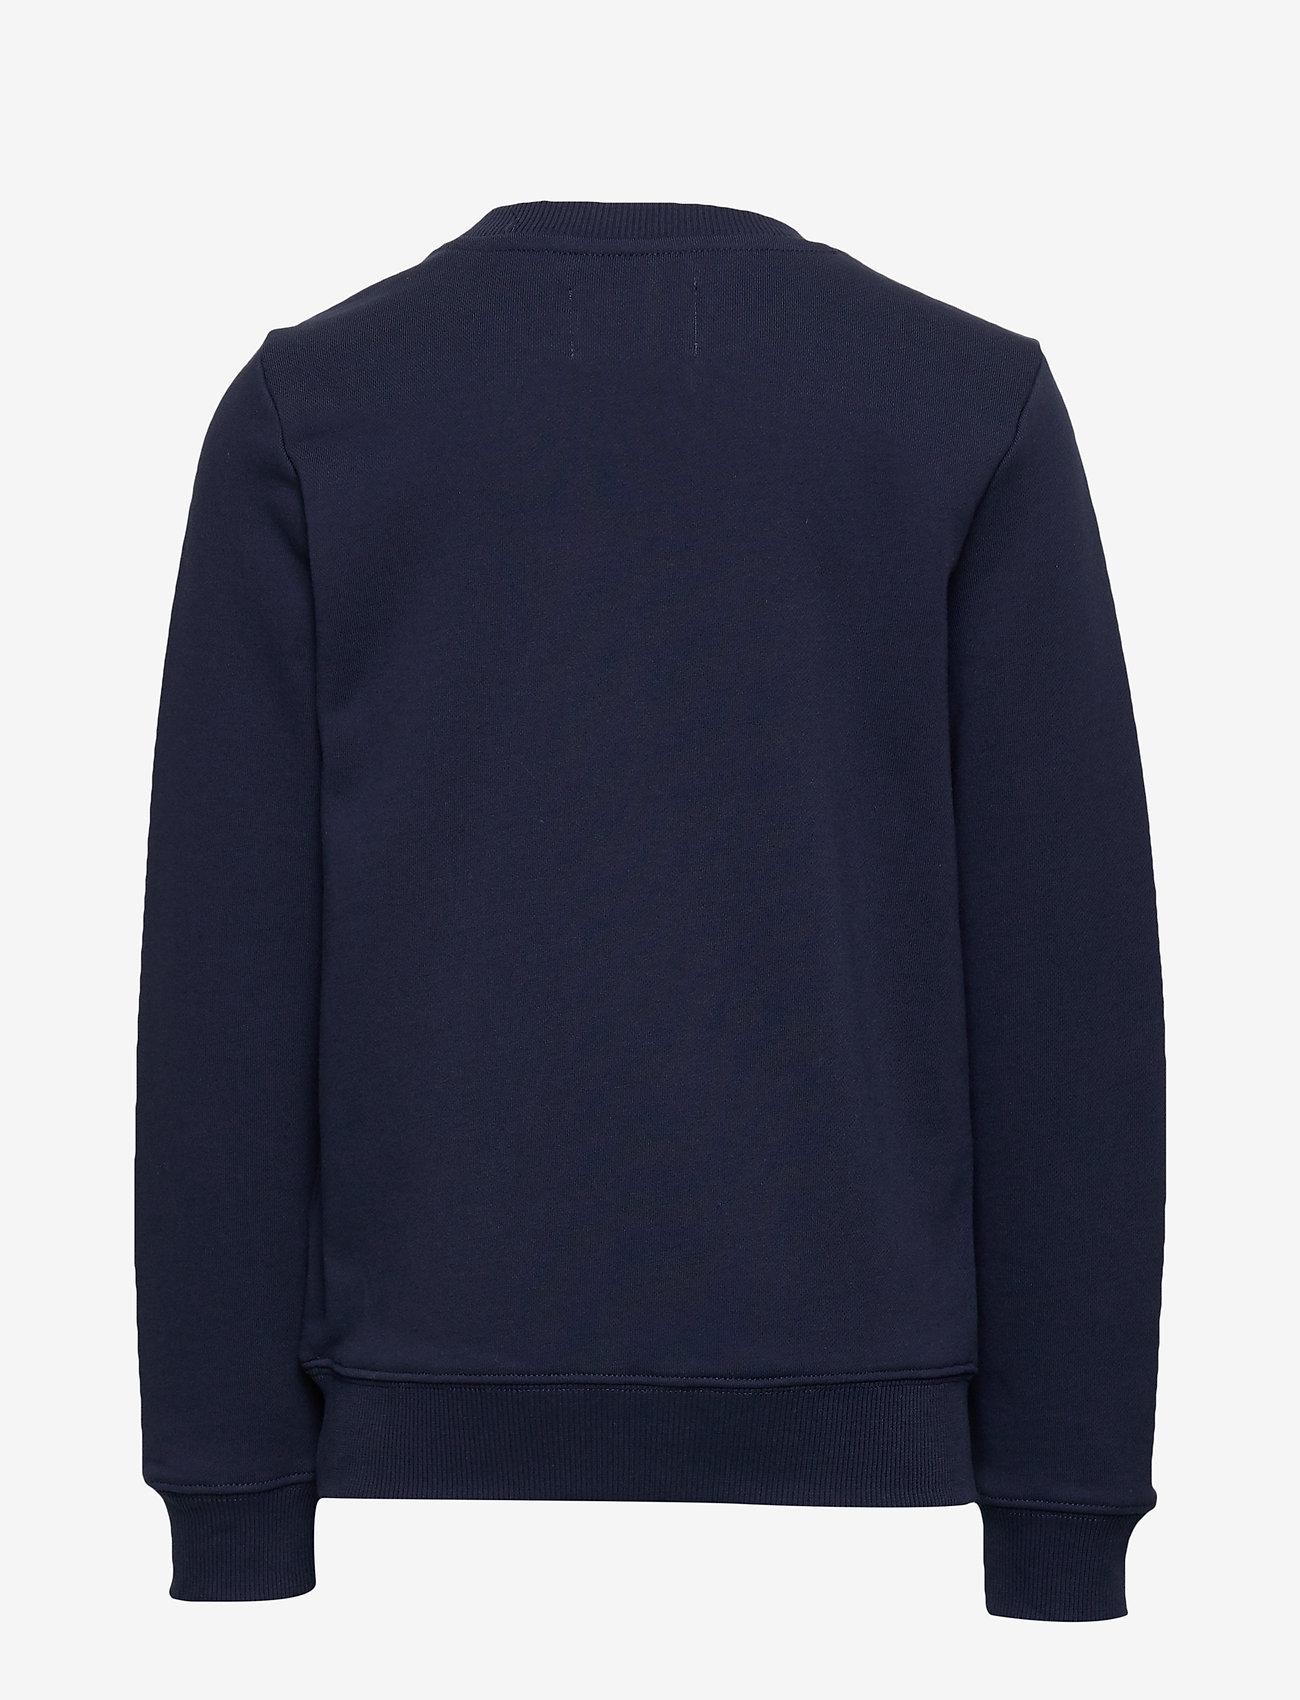 Calvin Klein - MONOGRAM LOGO SWEATSHIRT - sweatshirts - peacoat - 1